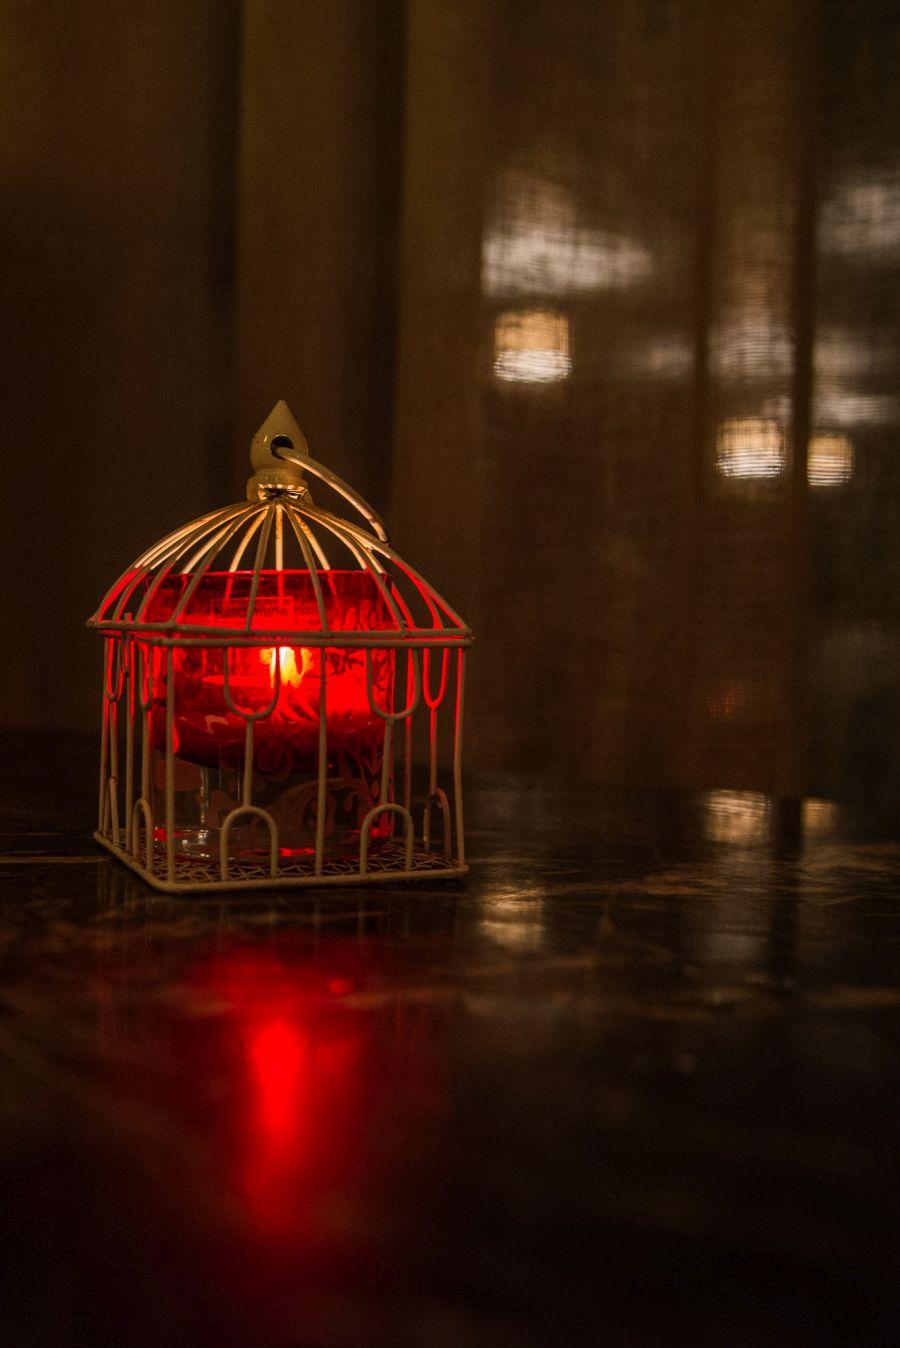 Lantern - The Aviary